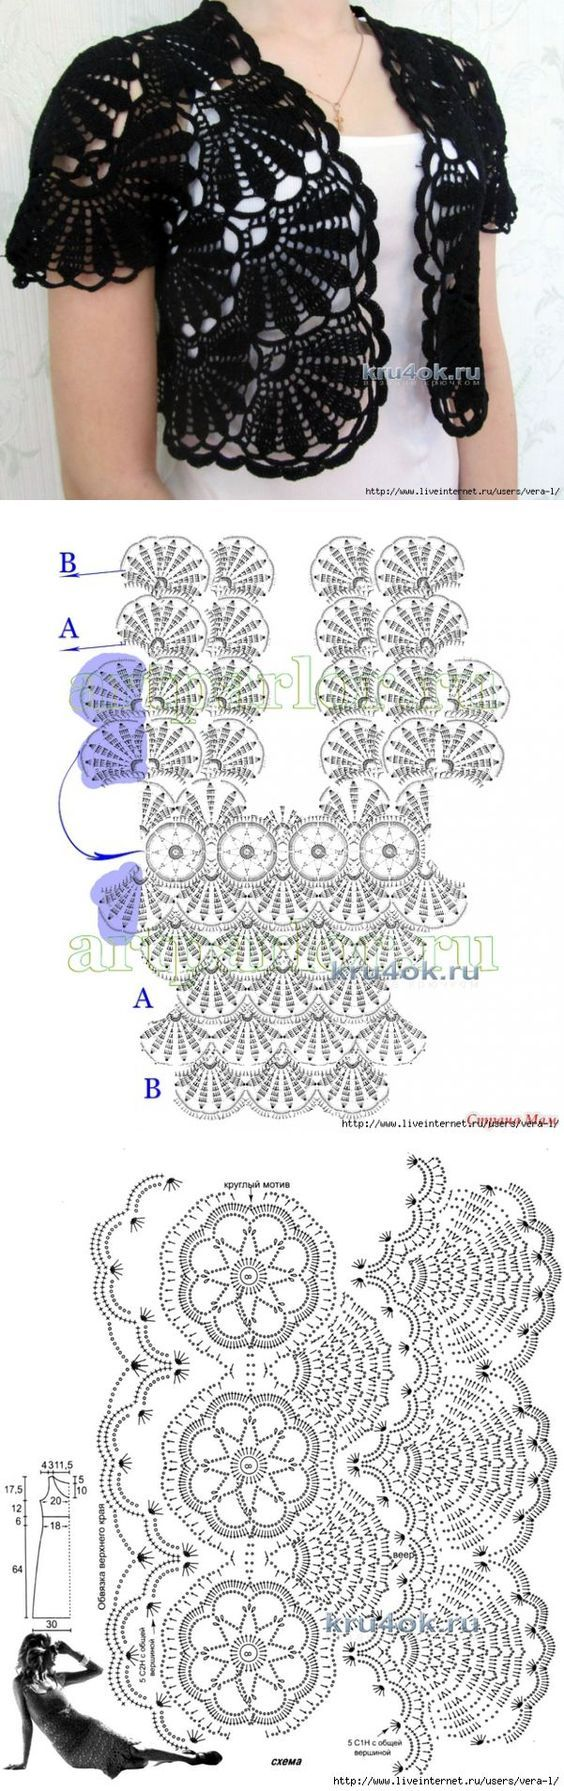 Pin de Saelah Amin en crochet | Pinterest | Boleros, Ganchillo y Tejido